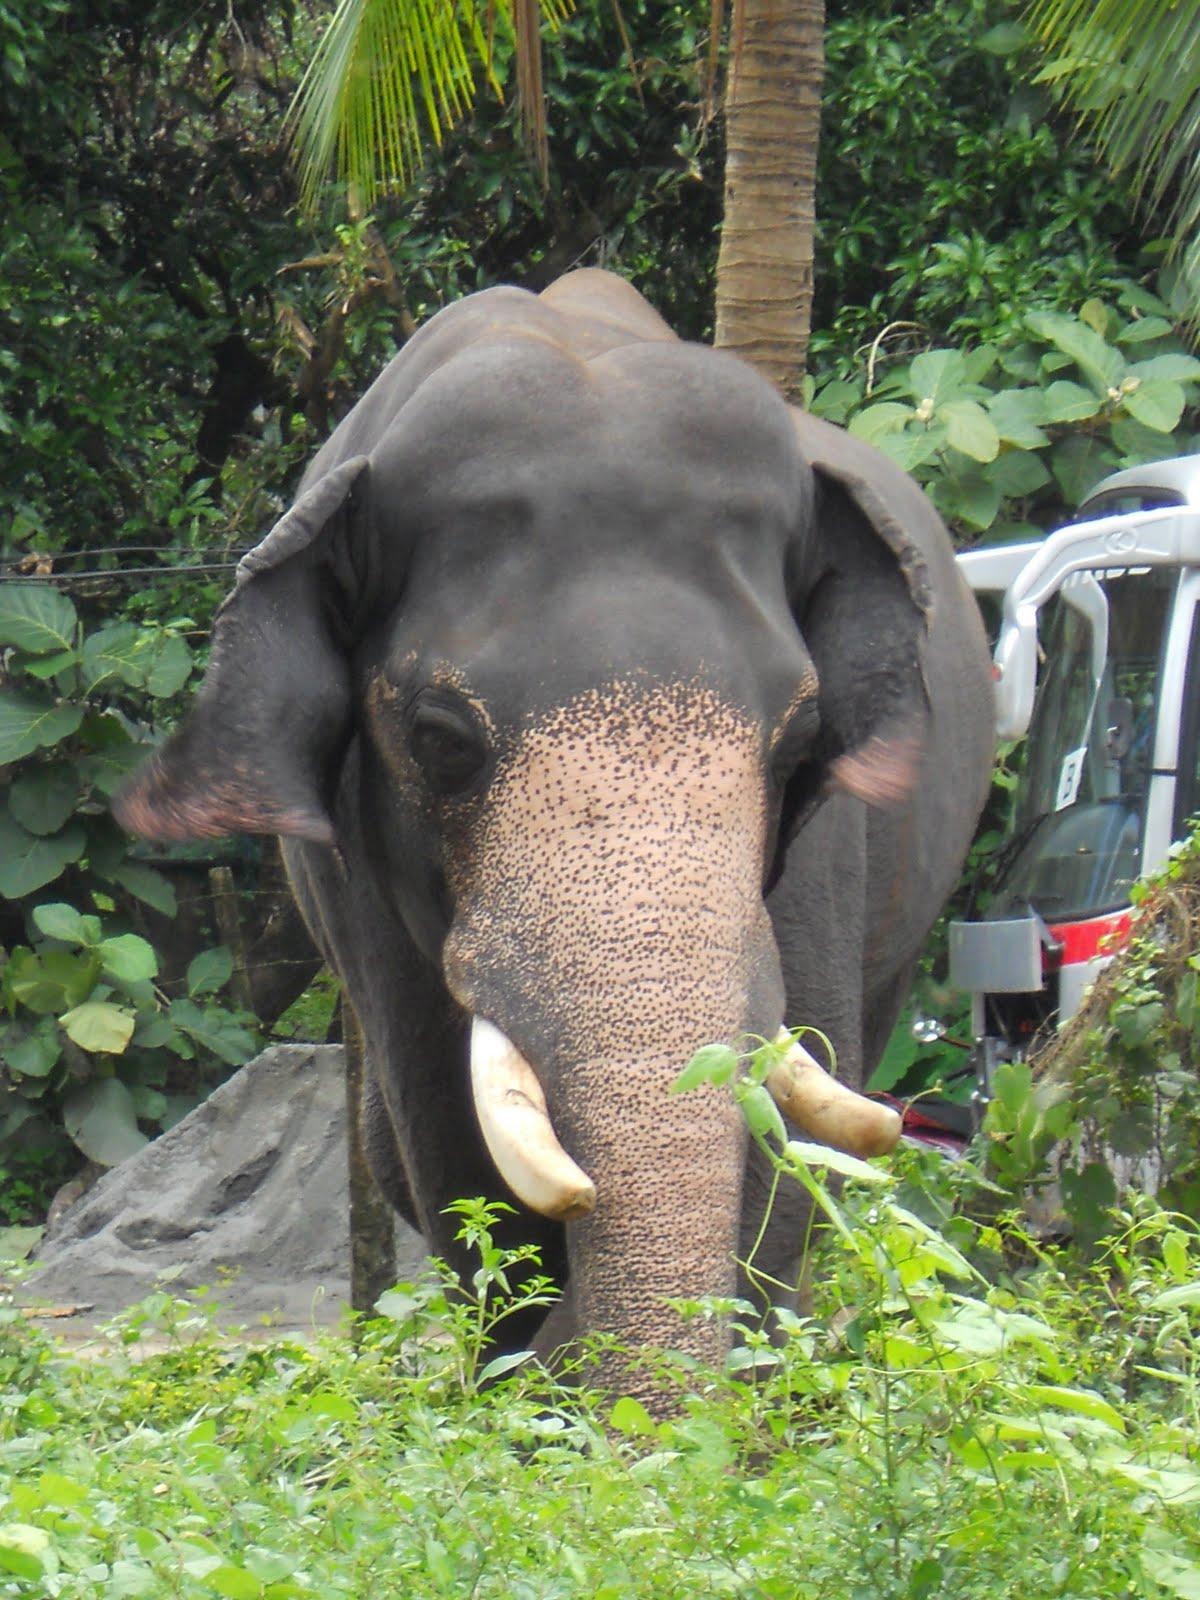 wallpapers name: Elephants in kerala